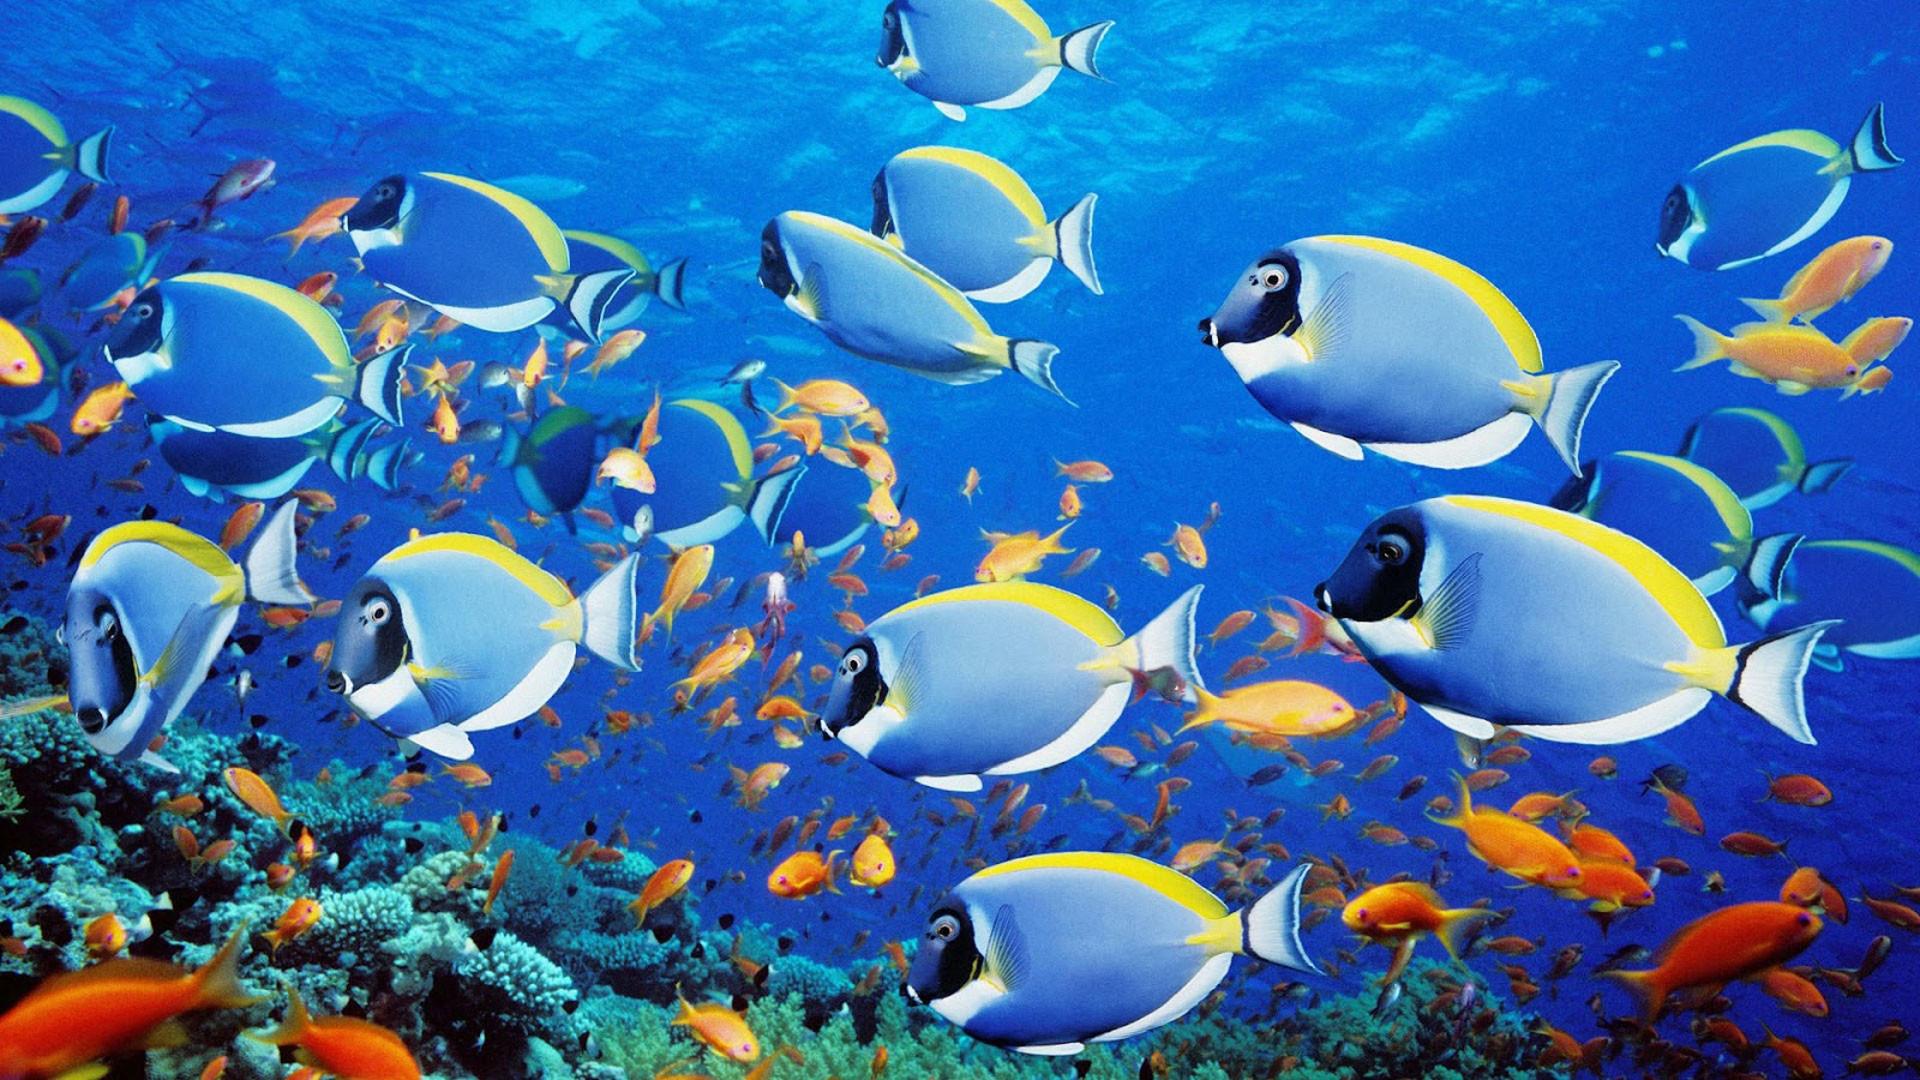 hd pics photos fish marine blue desktop background wallpaper